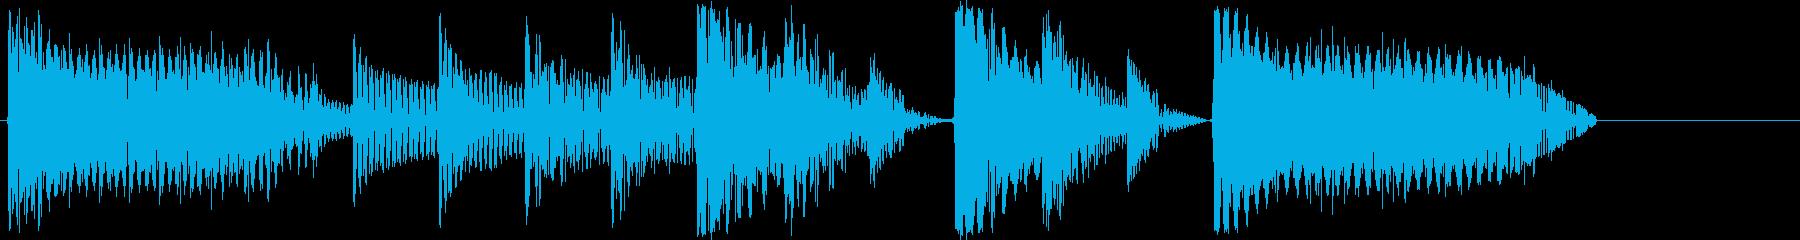 8bitジングル#1スタート&クリアの再生済みの波形